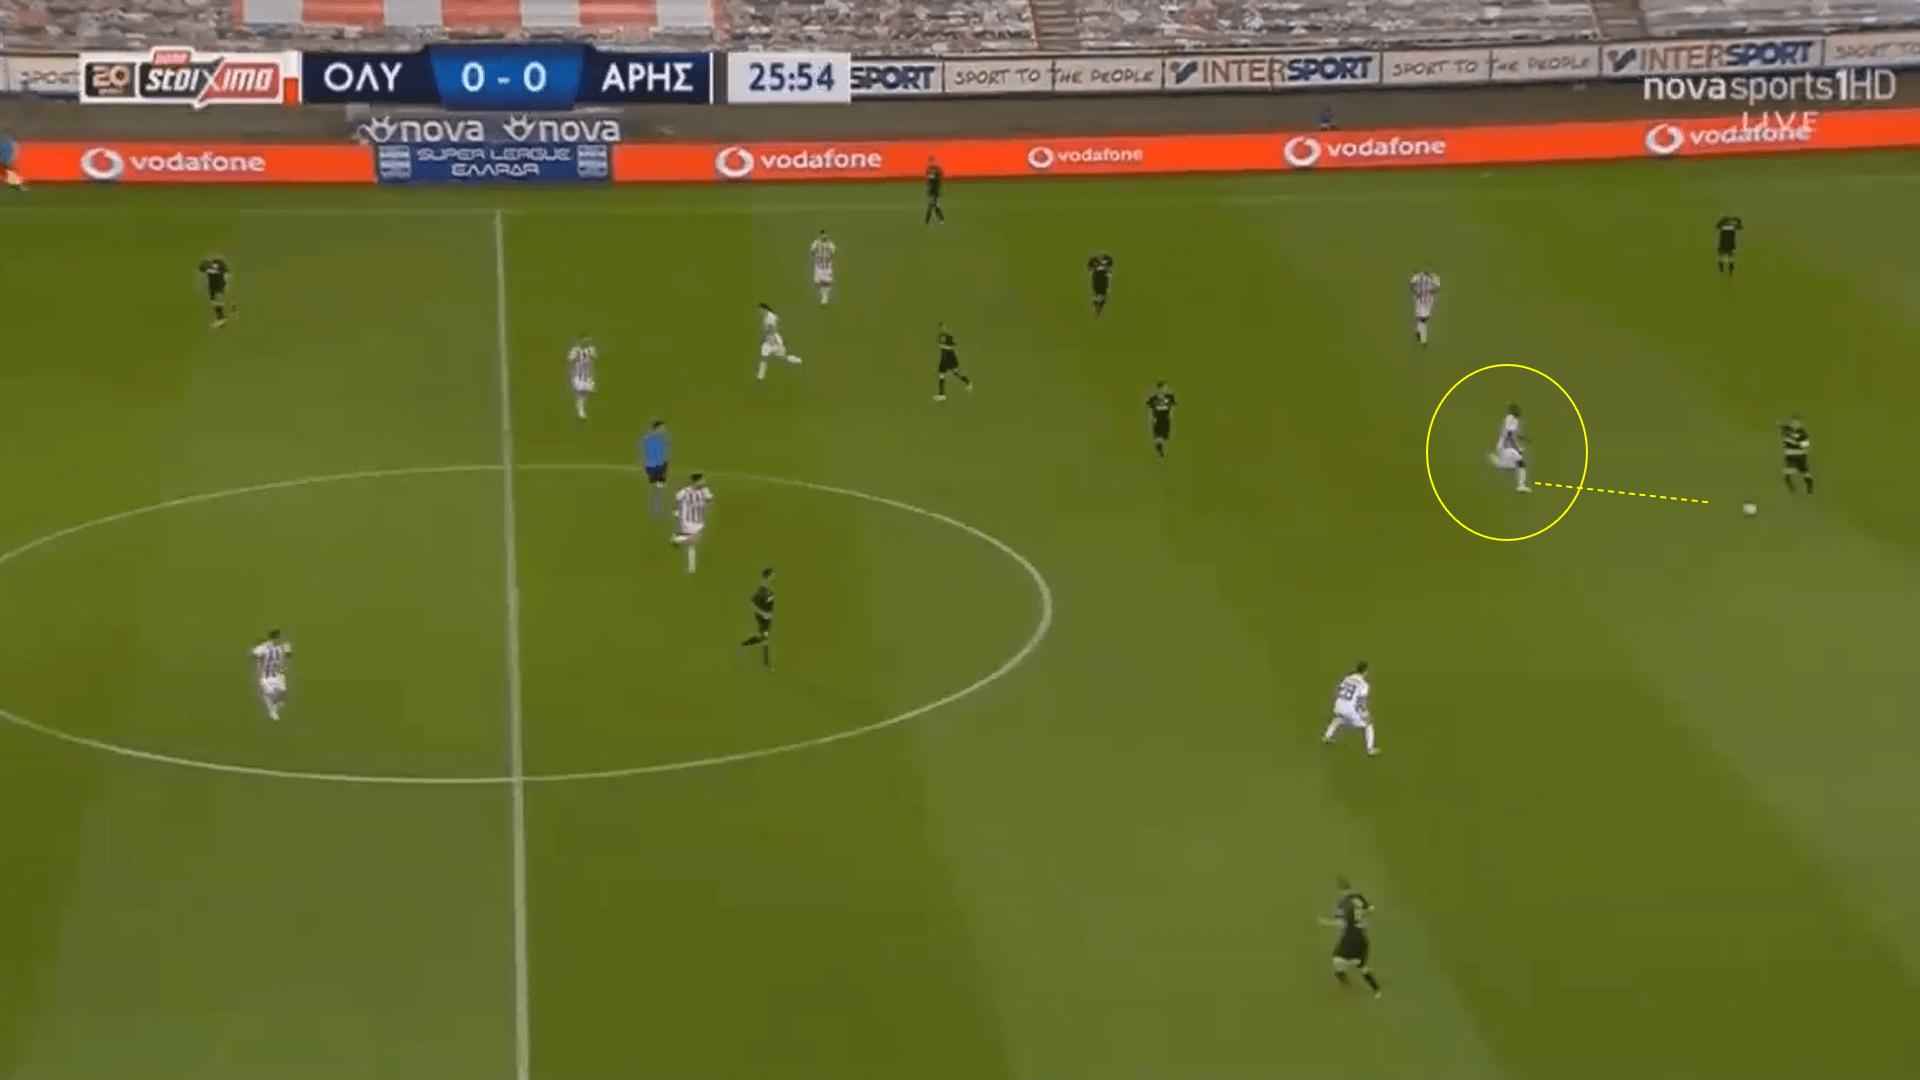 Mady Camara - Olympiakos midfielder ready for the Premier League? - tactical analysis tactics